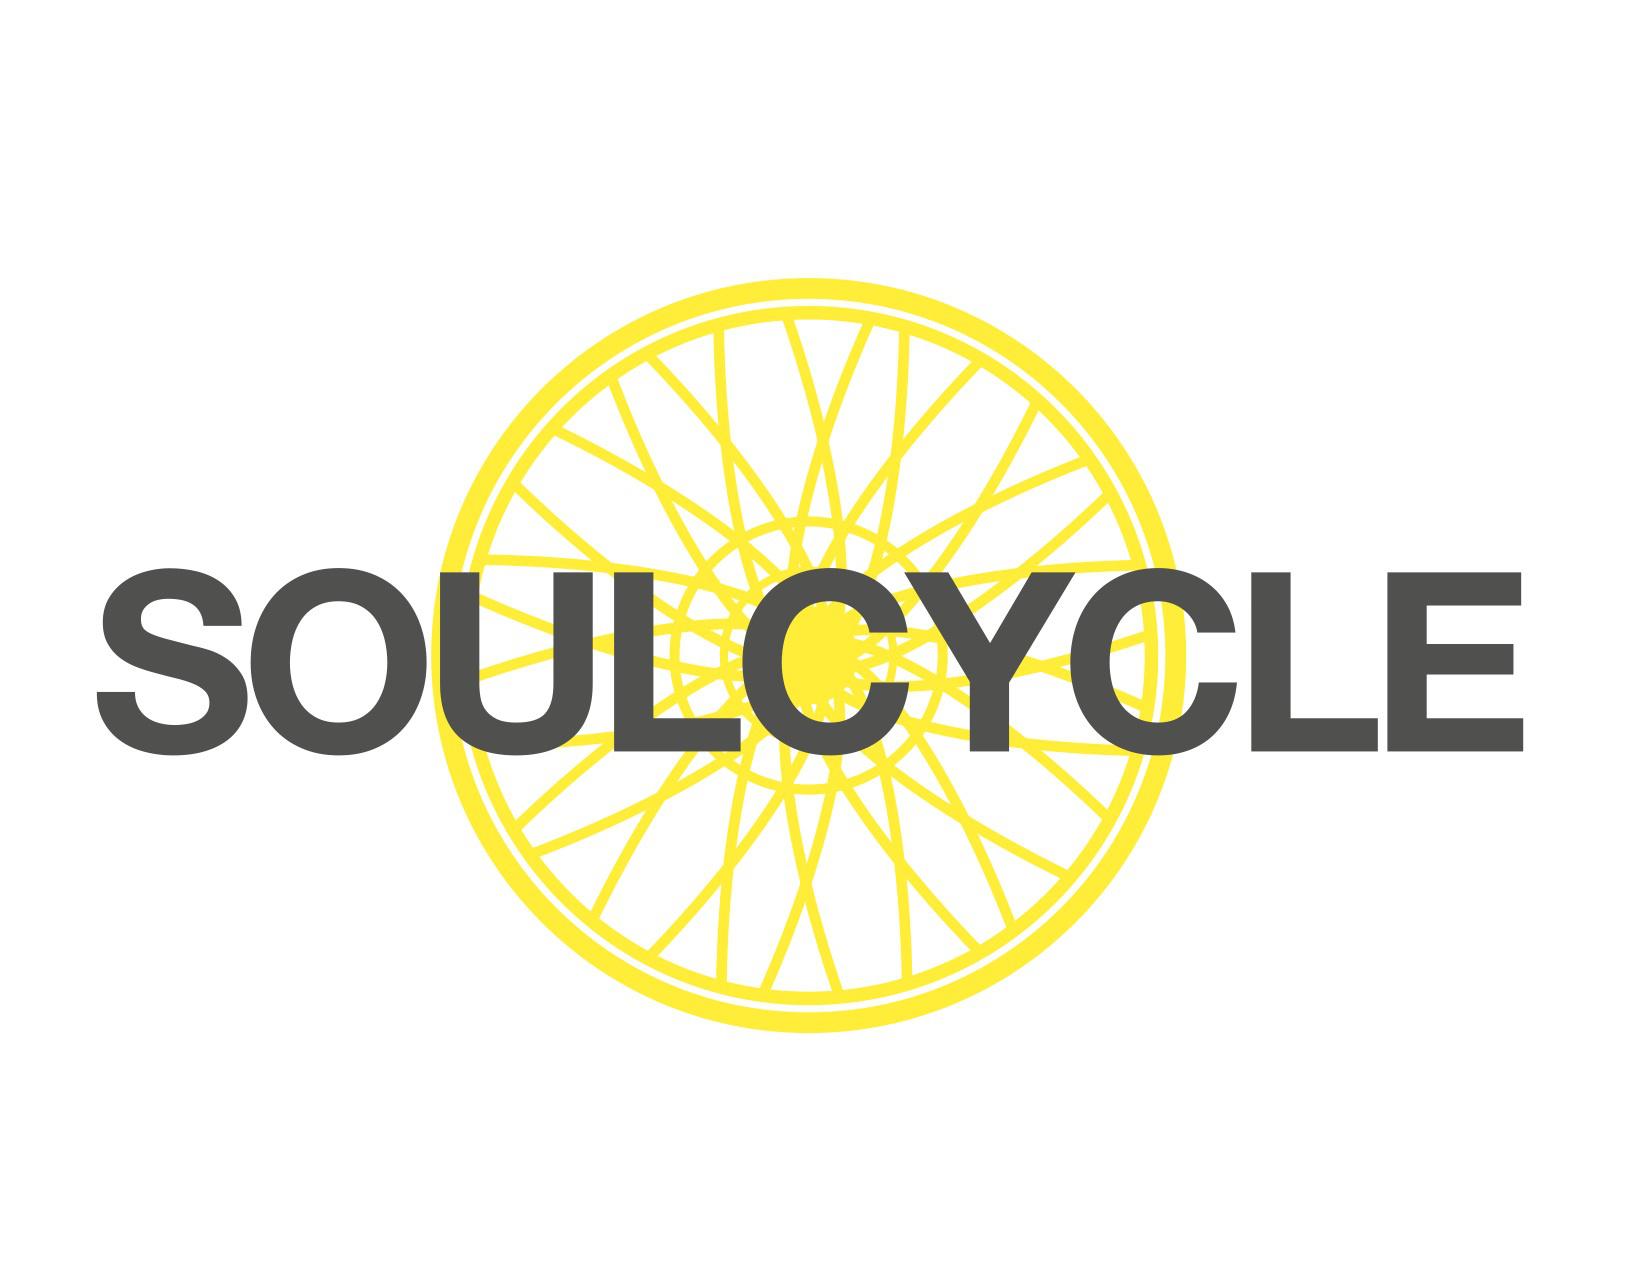 Soul cycle Logos.